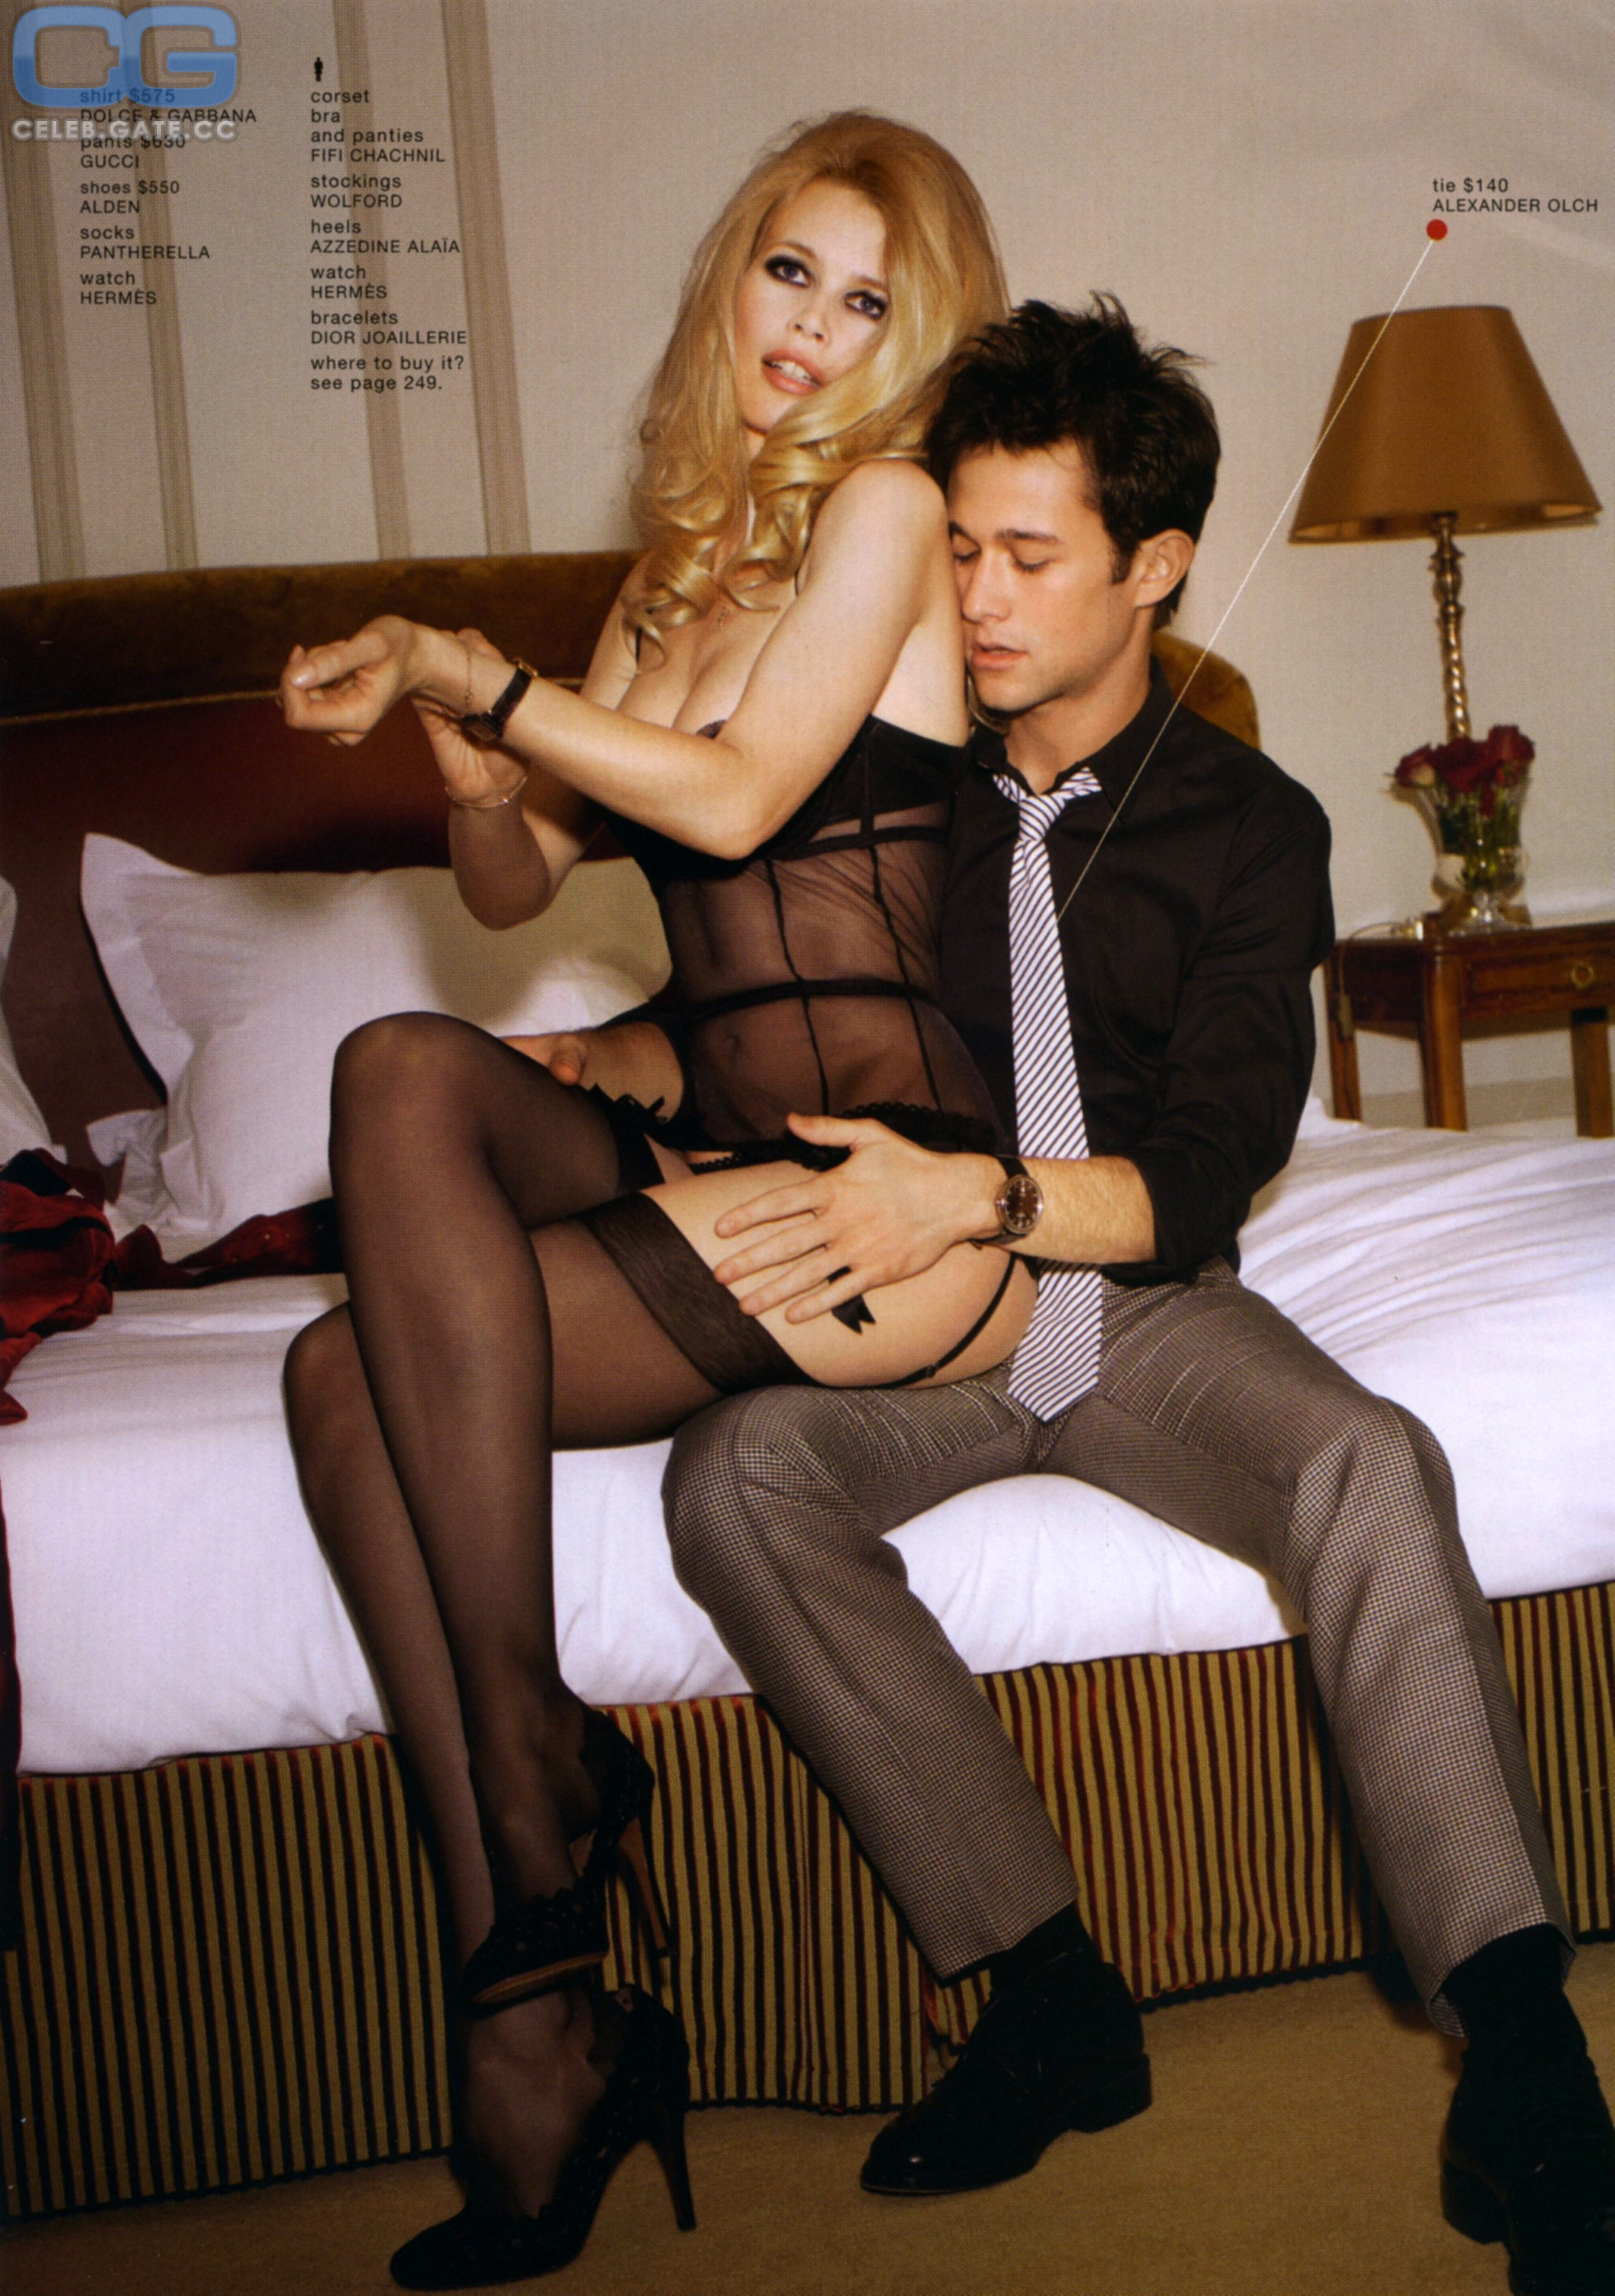 Playboy claudia schiffer 1989